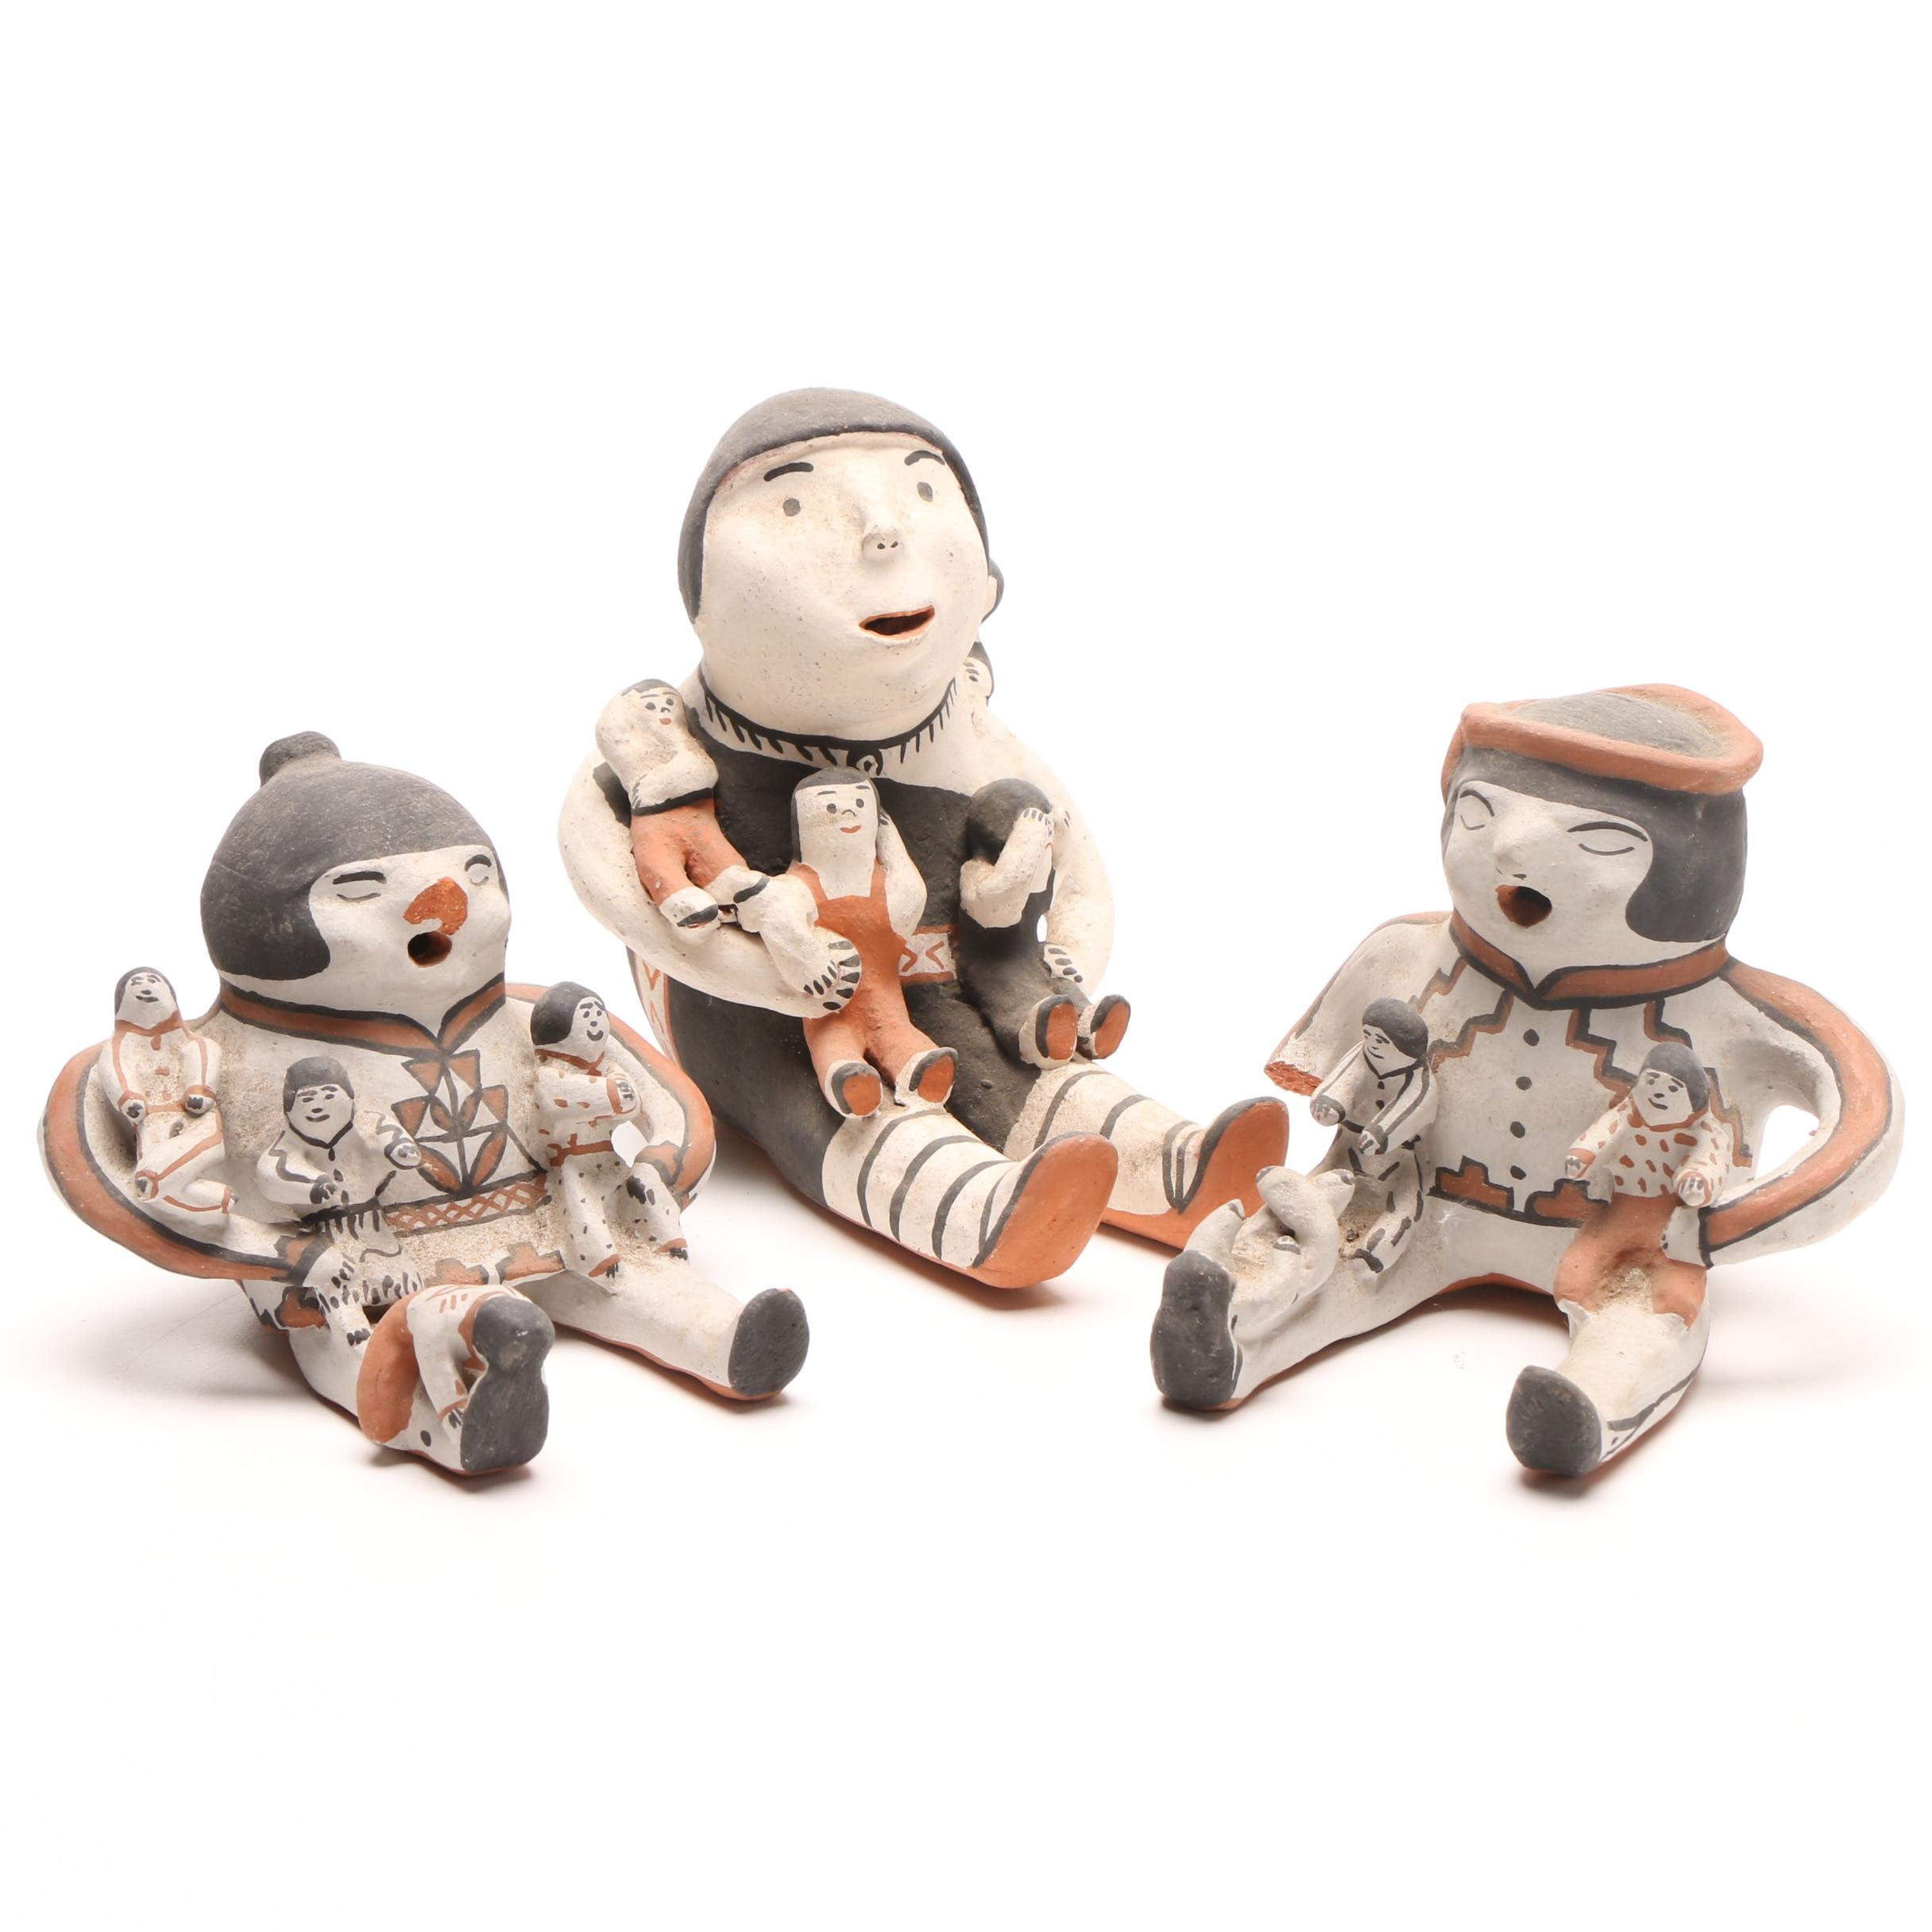 Jemez Pueblo Hand-Painted Pottery Storyteller Figurines